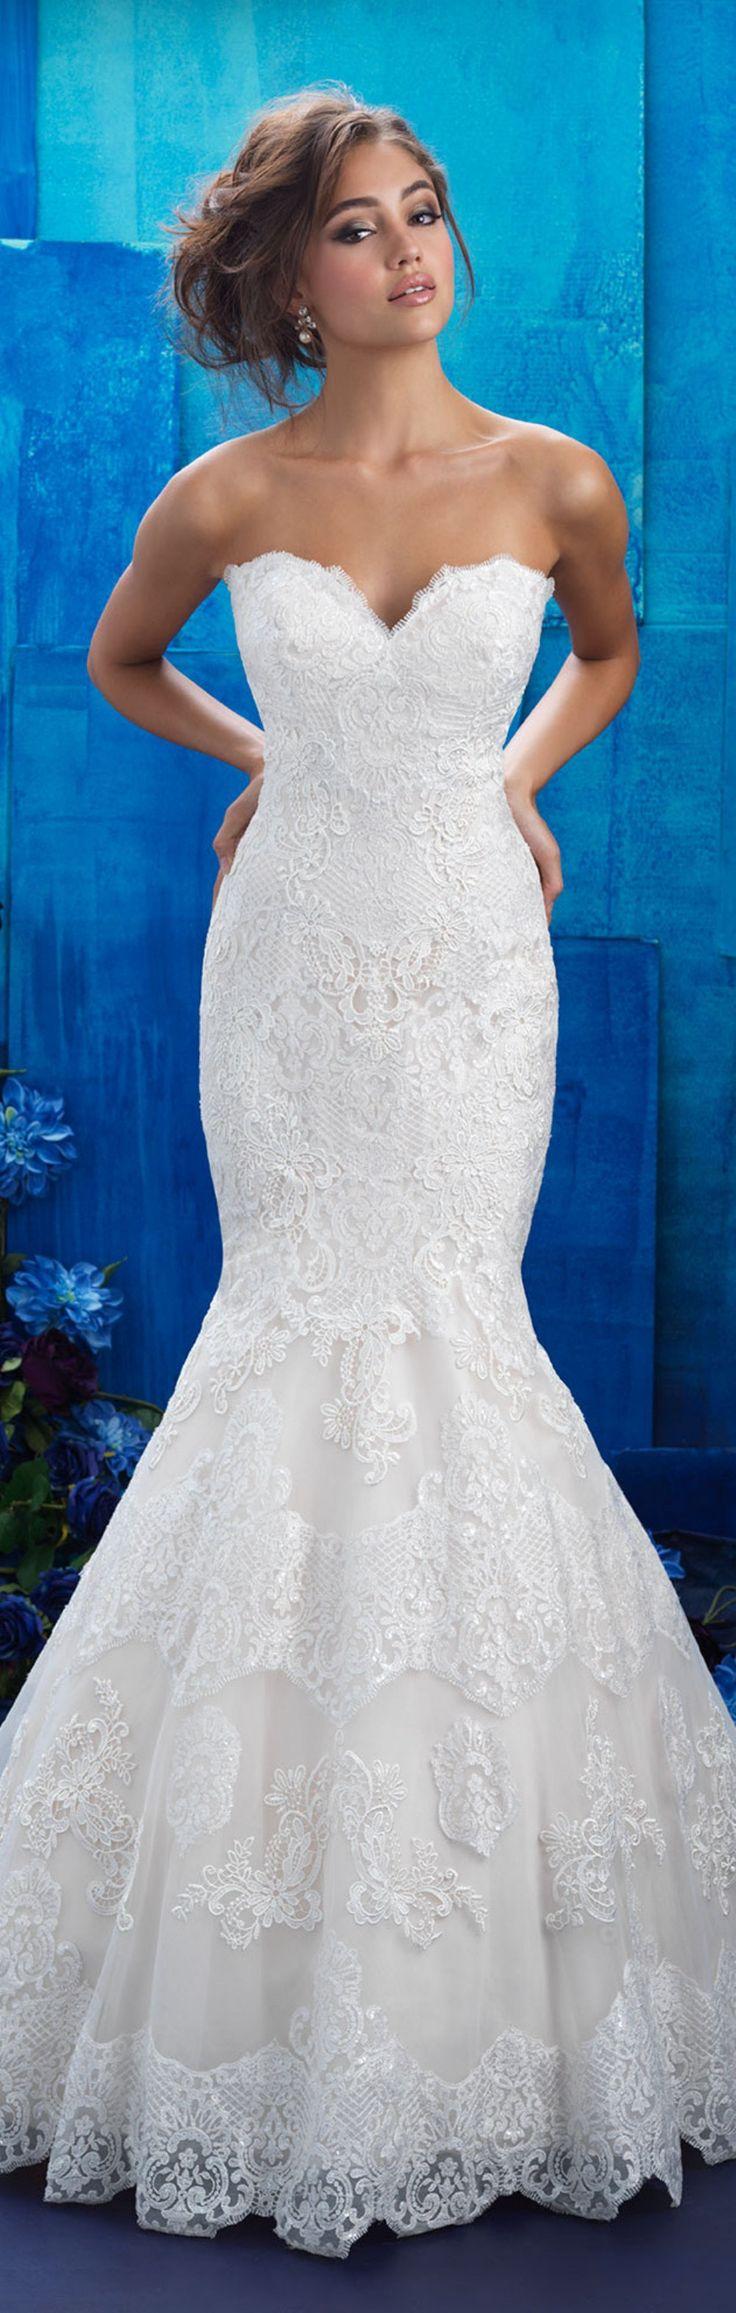 nice 37 Elegant Lace Mermaid Wedding Dress From World Class Designer  https://viscawedding.com/2017/04/16/37-elegant-lace-mermaid-wedding-dress-from-world-class-designer/